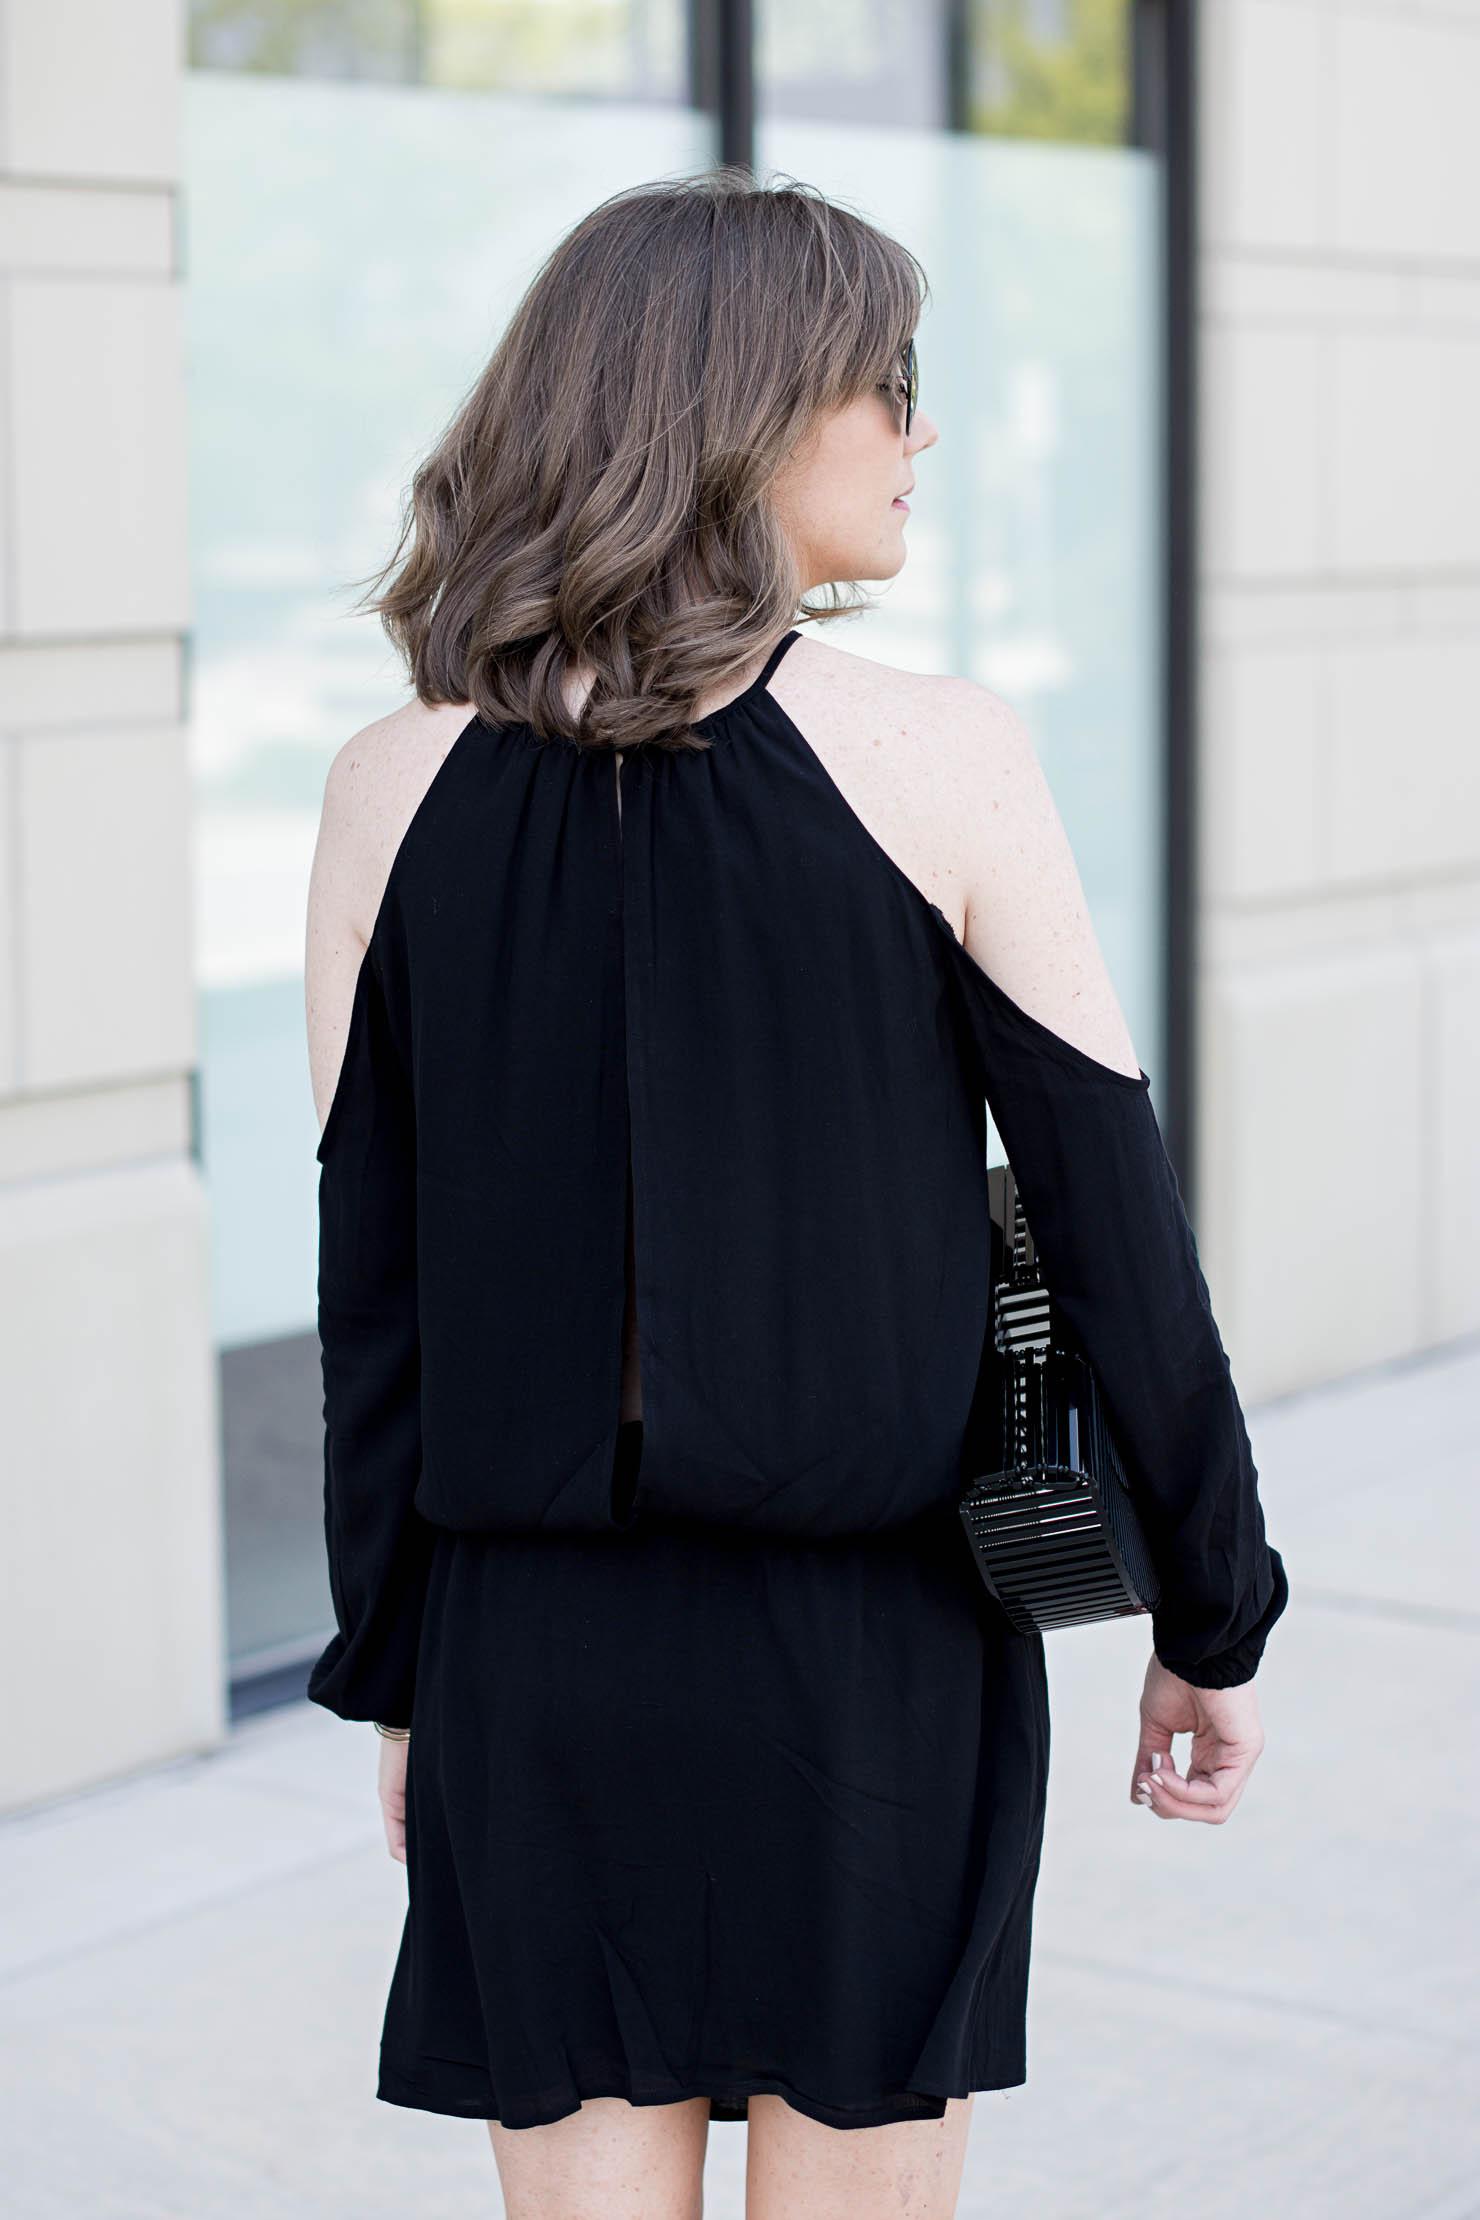 tobi cold shoulder open back summer dress, black cult gaia, clutch summer date night outfit, pompom sandals under $30, festival style